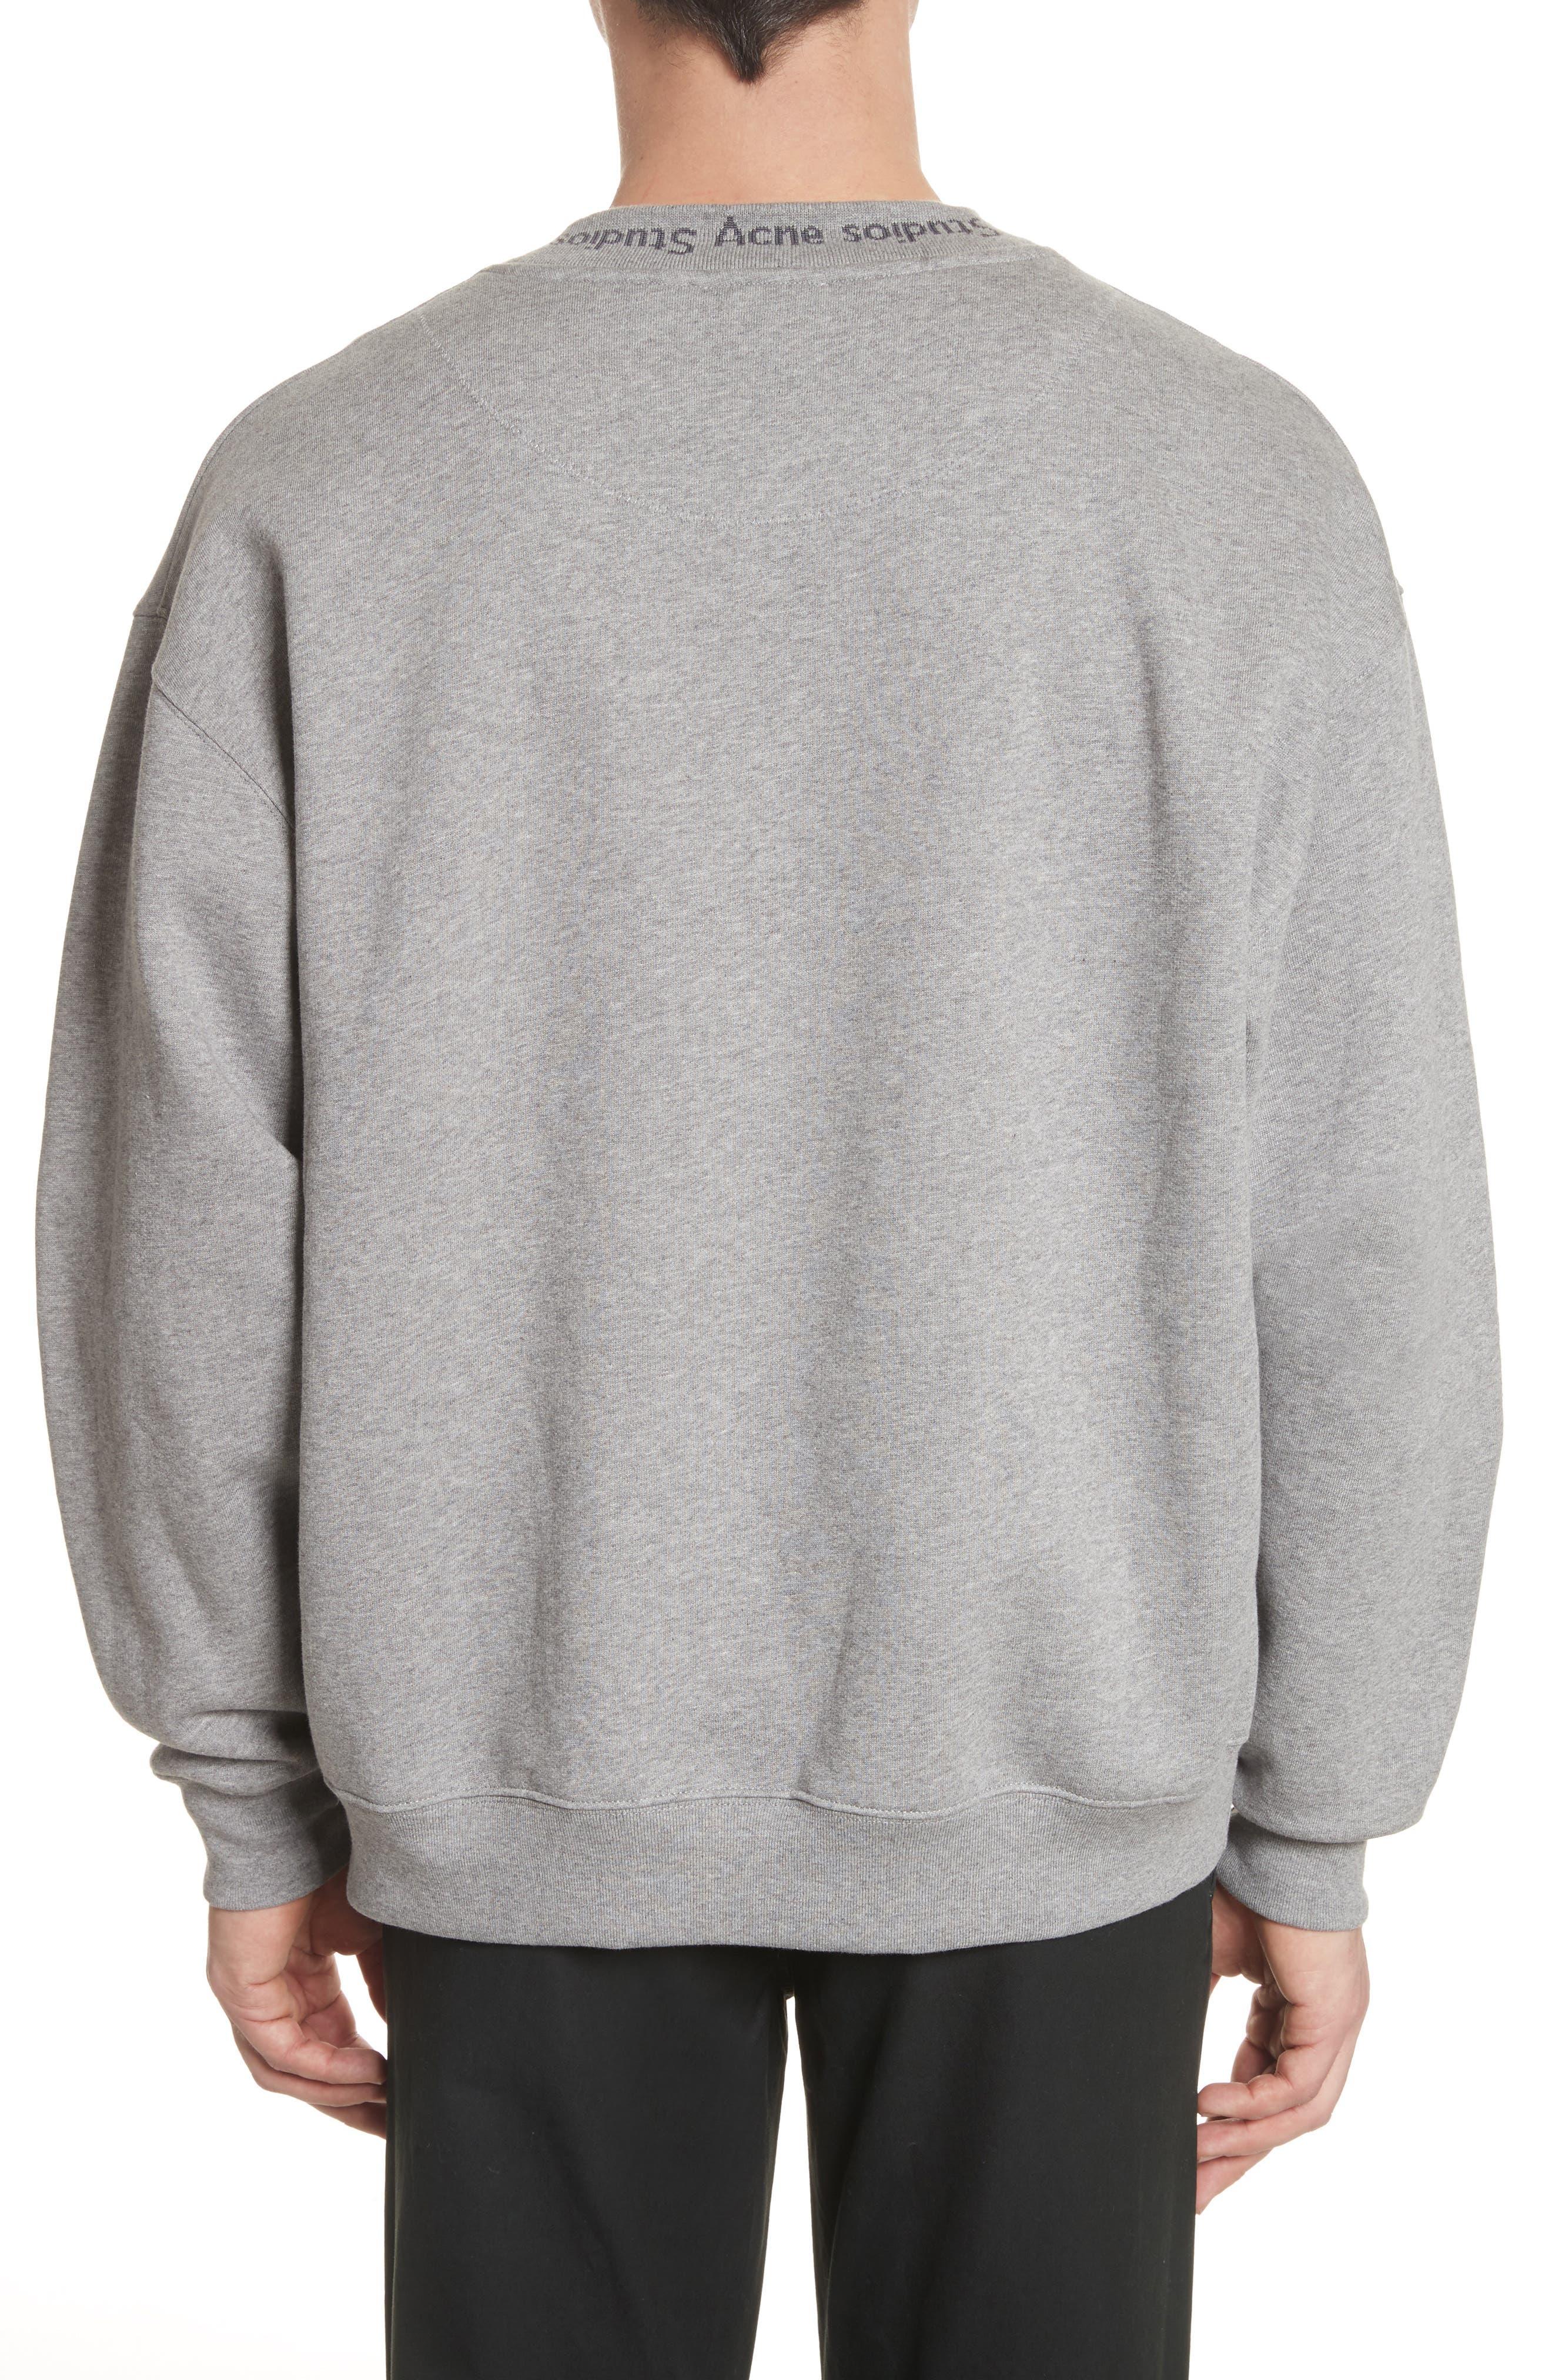 Flogo Oversize Cotton Sweatshirt,                             Alternate thumbnail 2, color,                             LIGHT GREY MELANGE